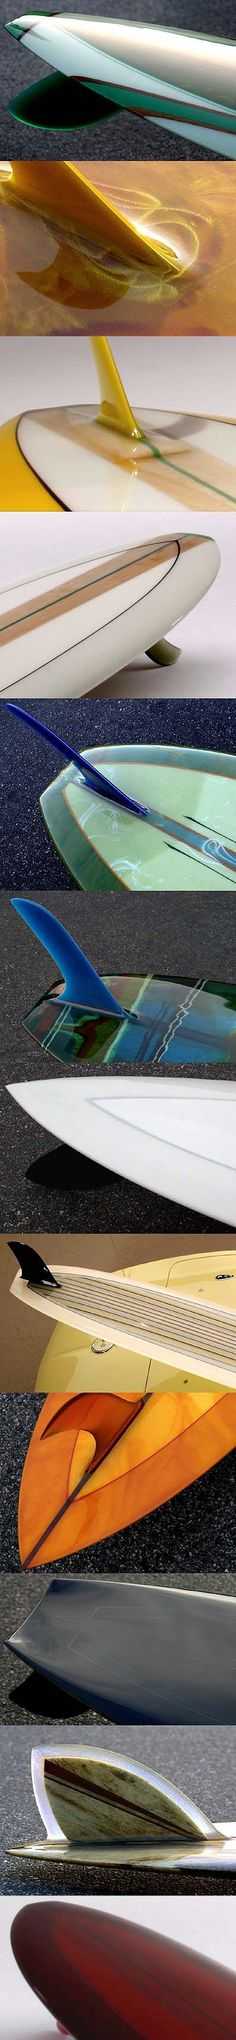 Cooperfish Surfboards